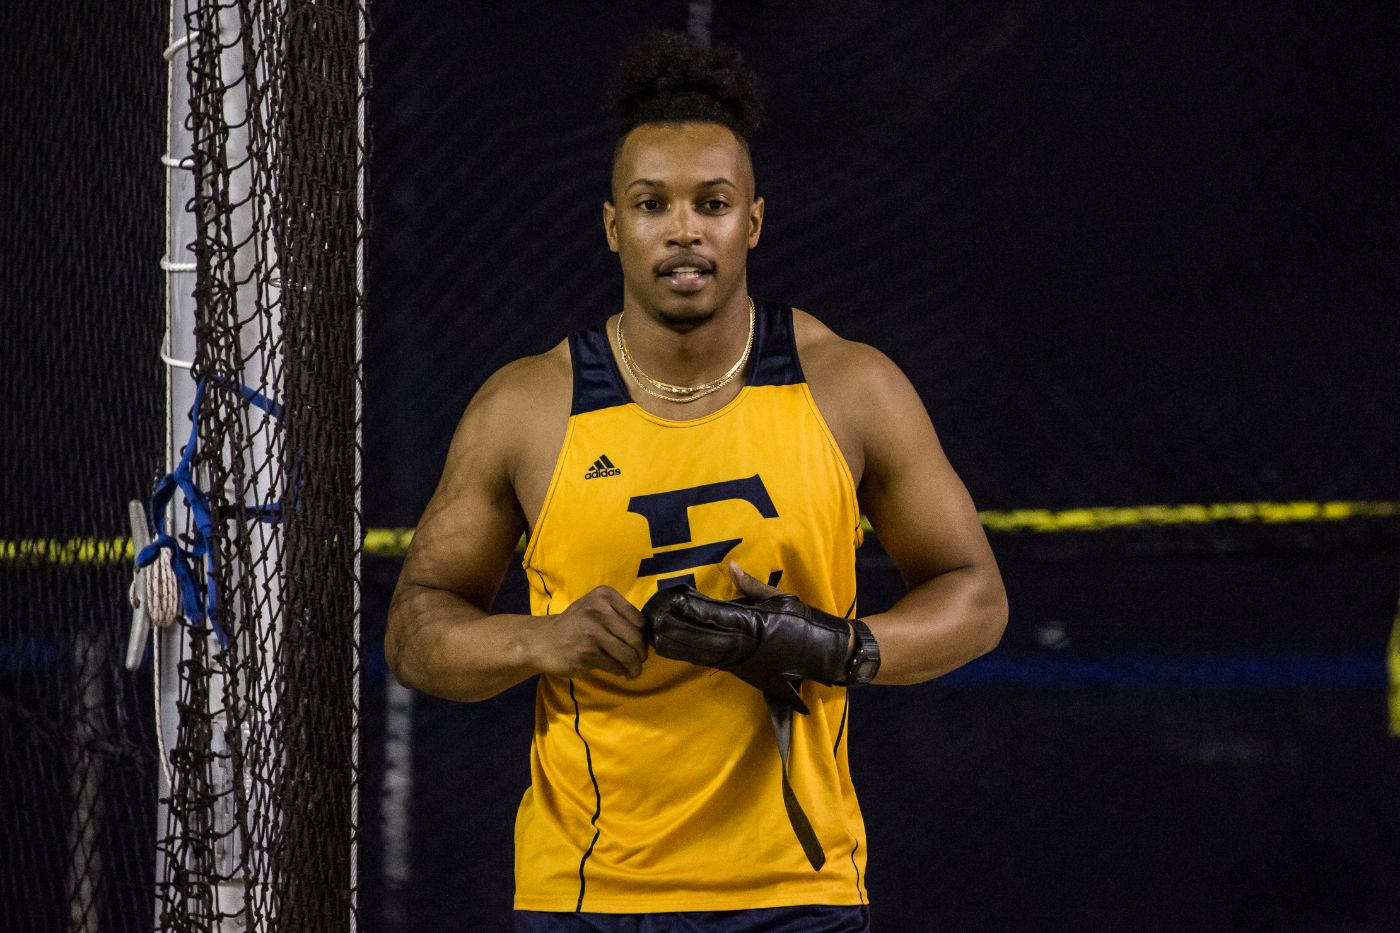 Johnson Named SoCon Field Athlete of the Week